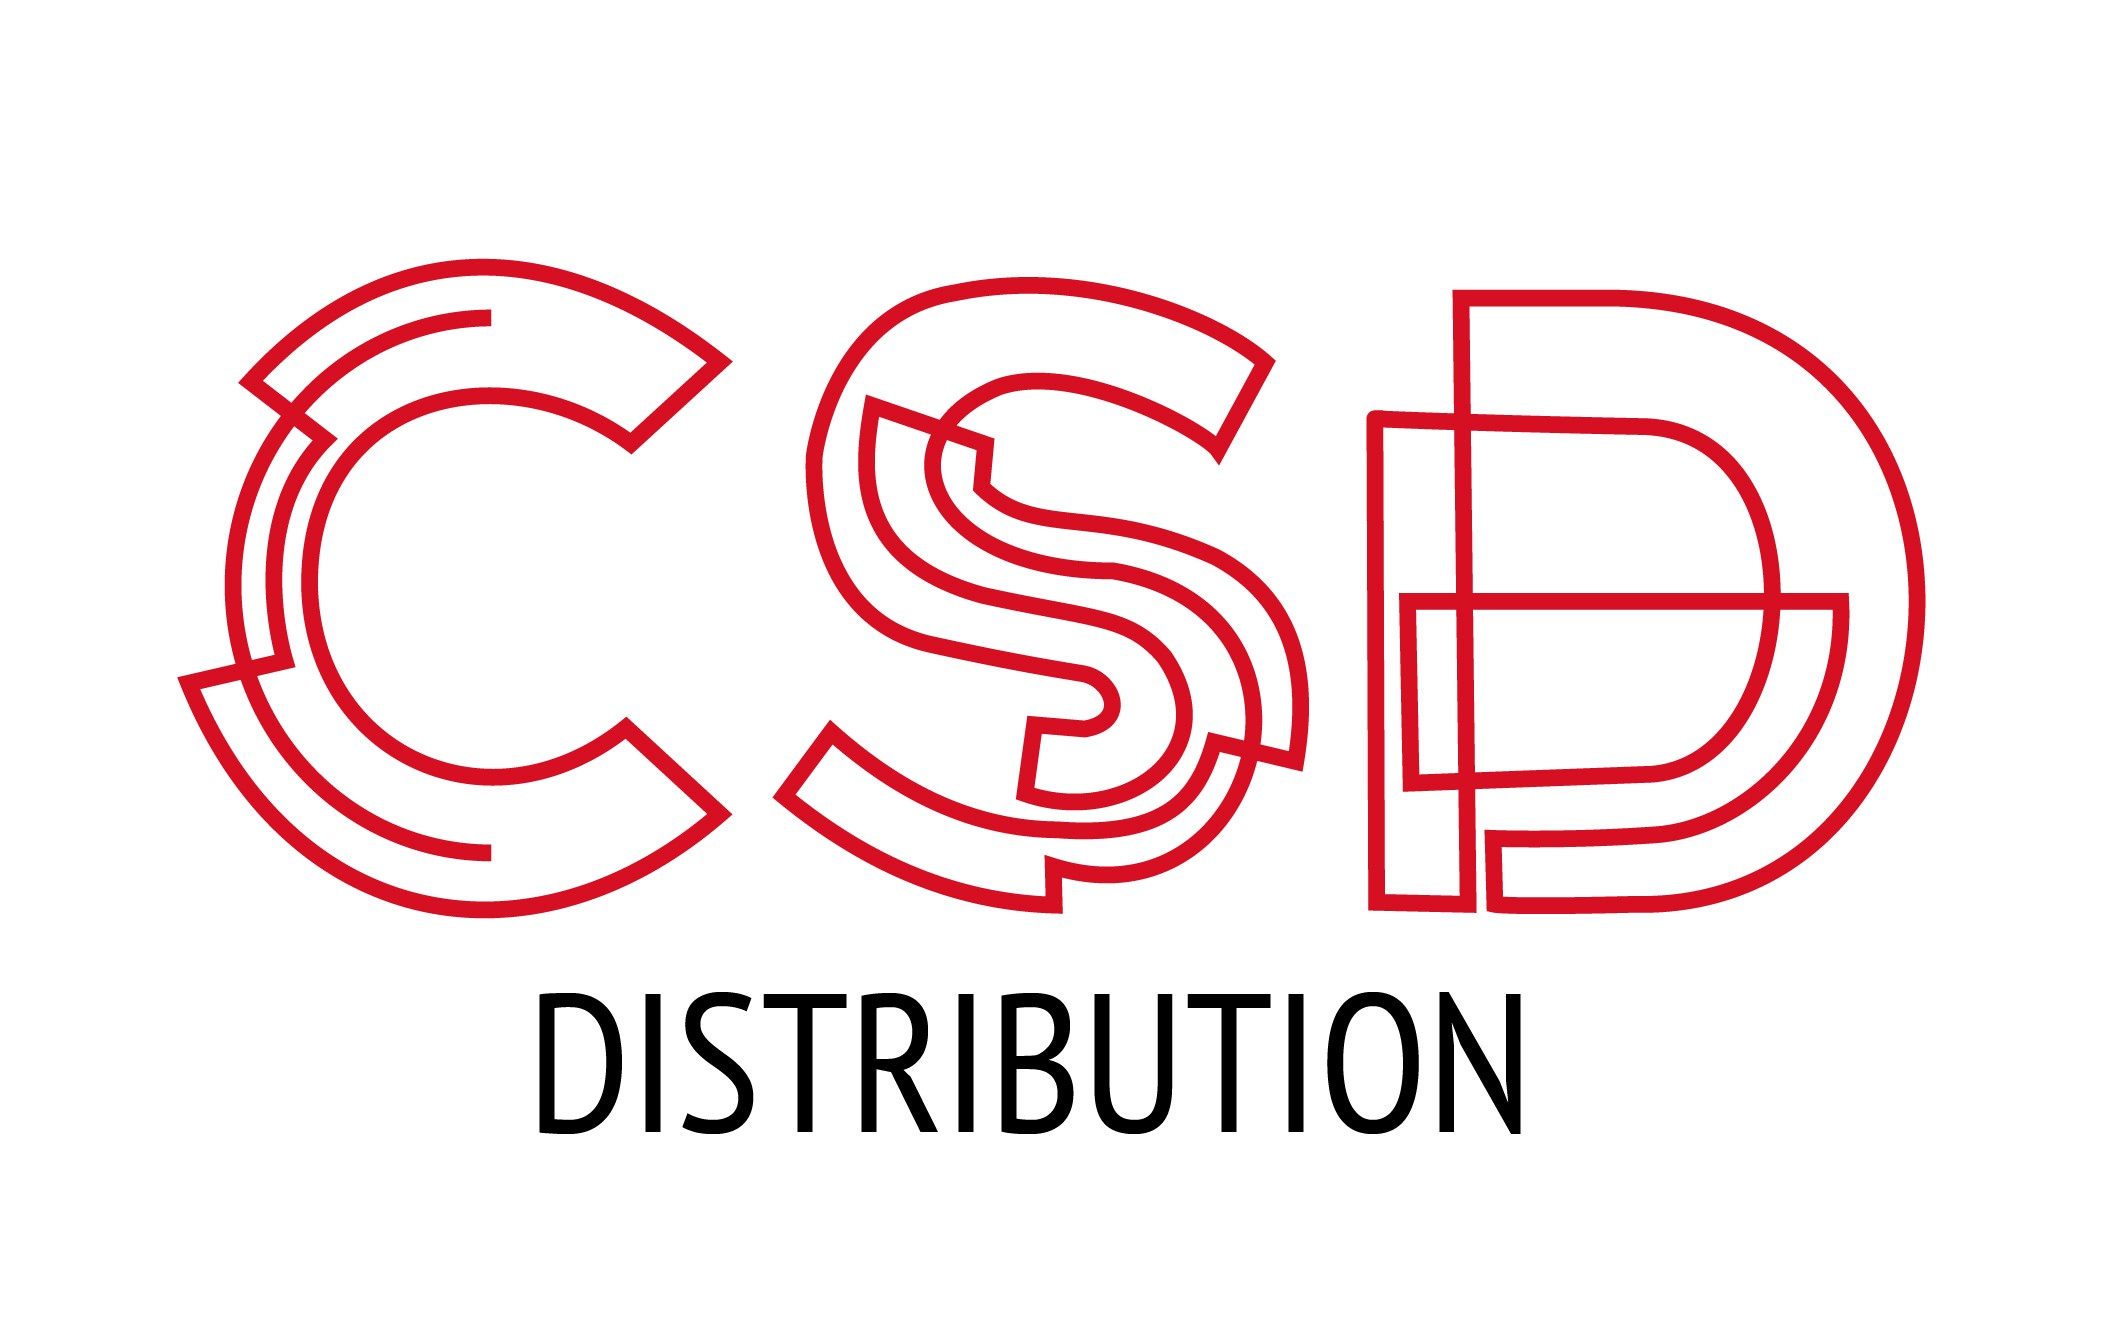 CSD DISTRIBUTION